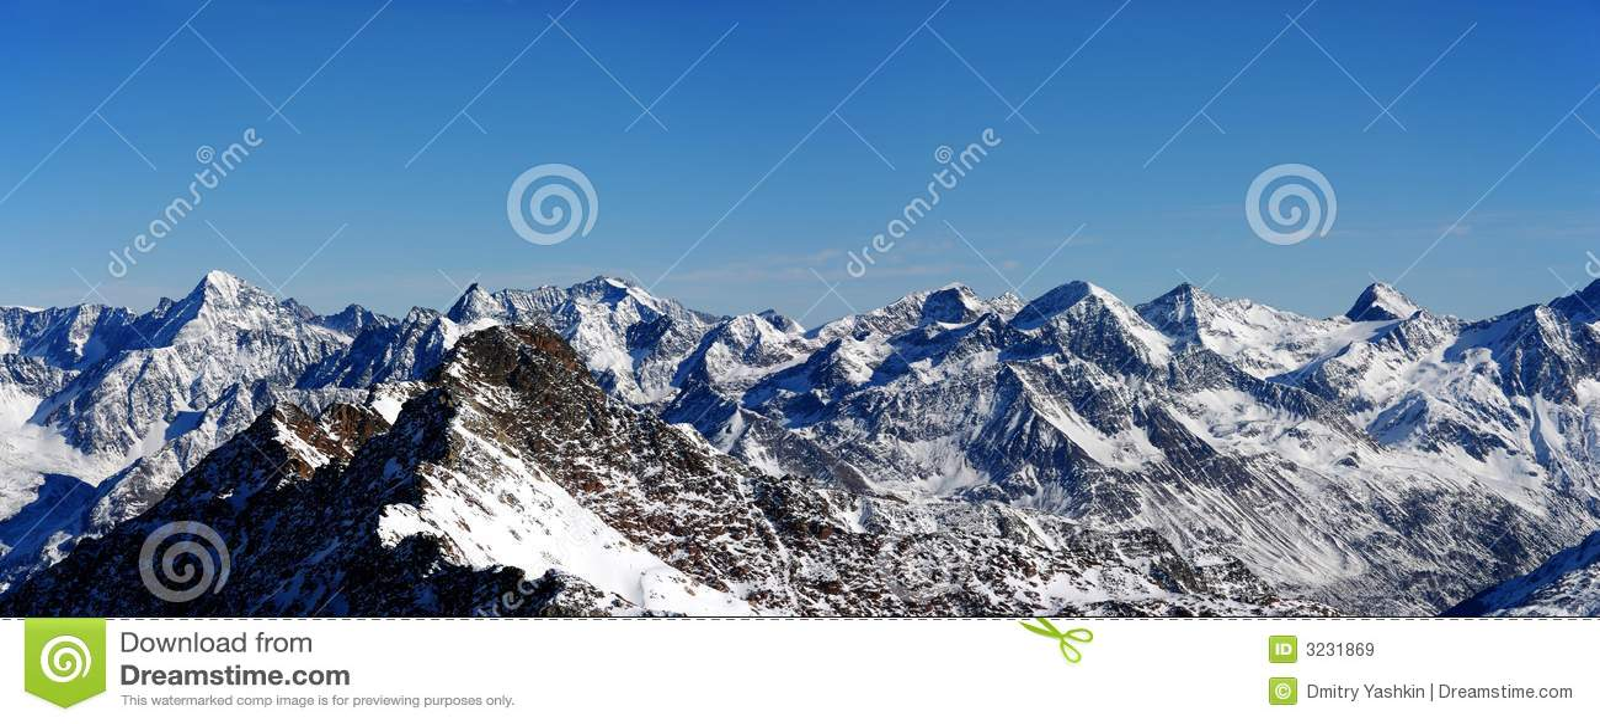 Il panorama alpino